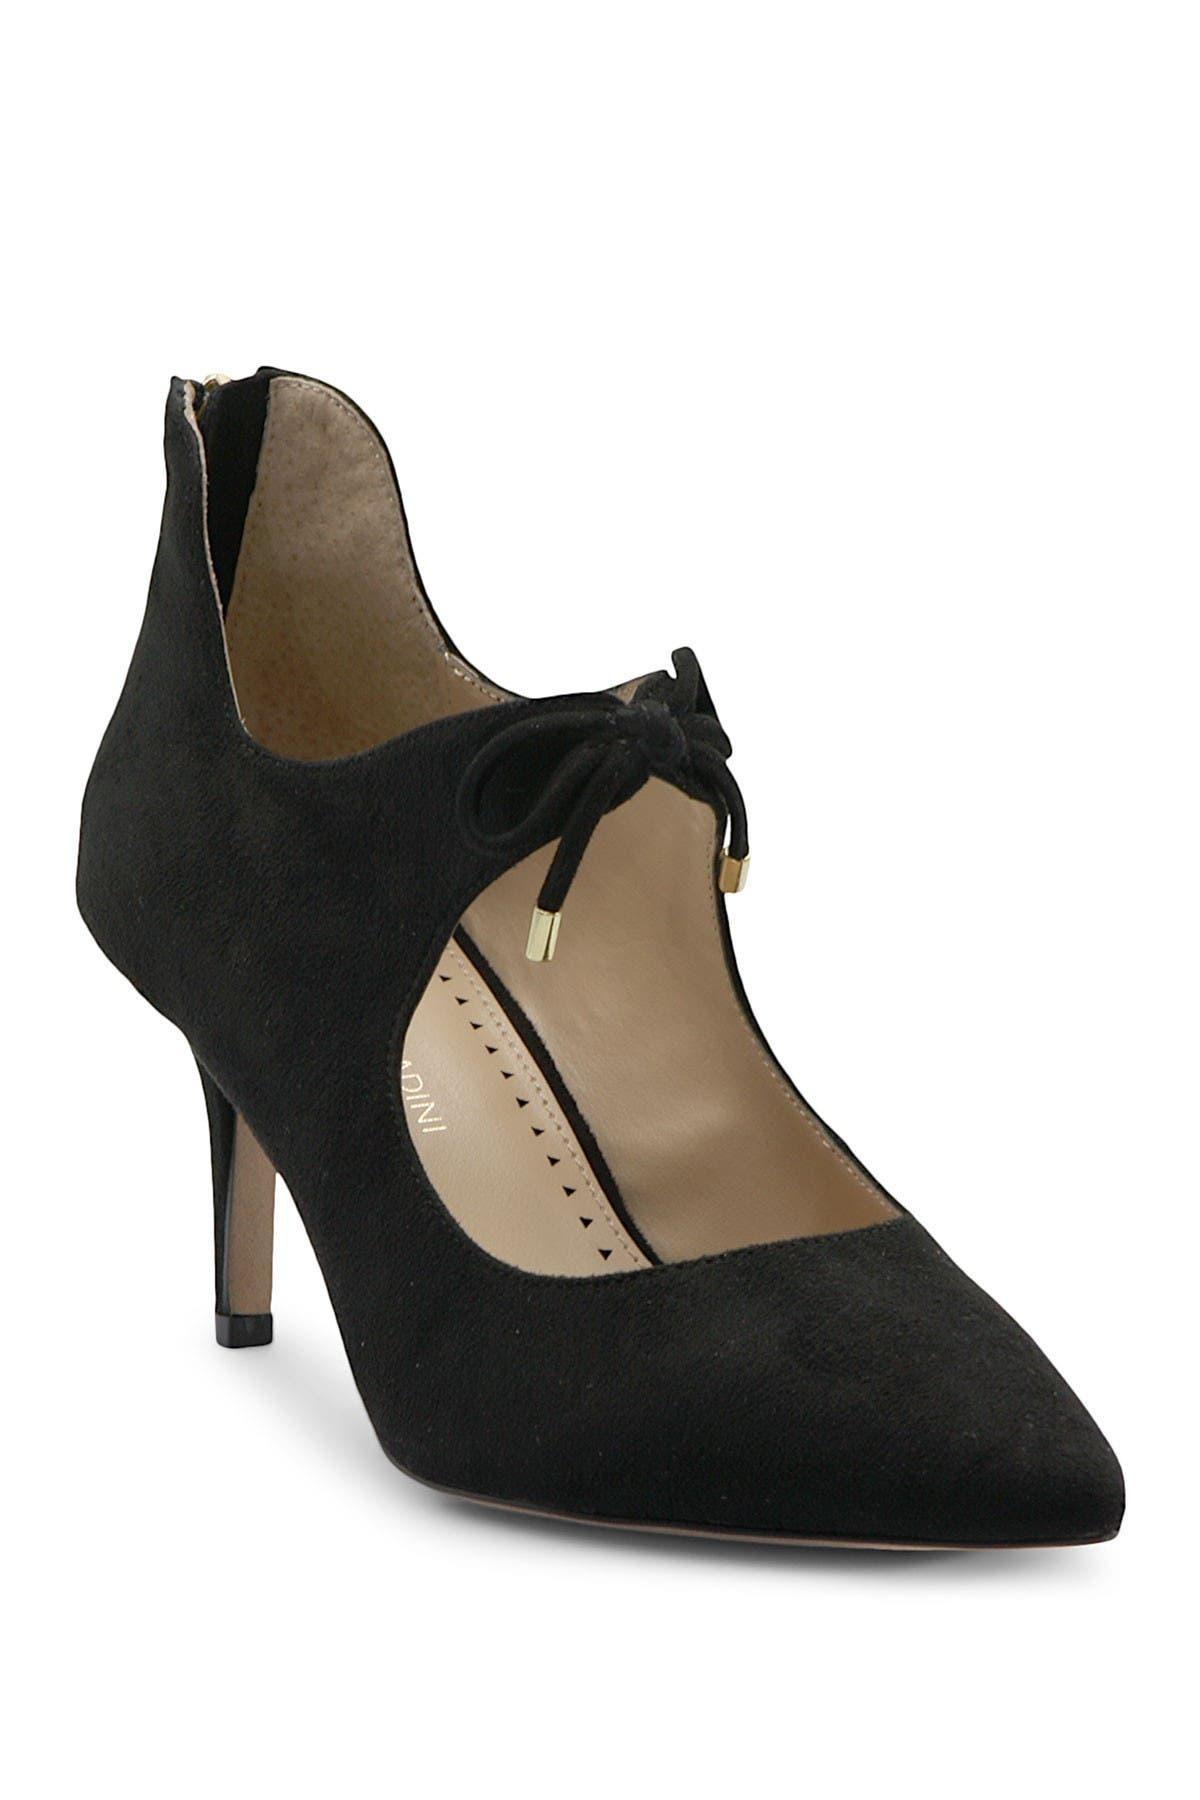 Image of Adrienne Vittadini Filbert Stiletto Heel